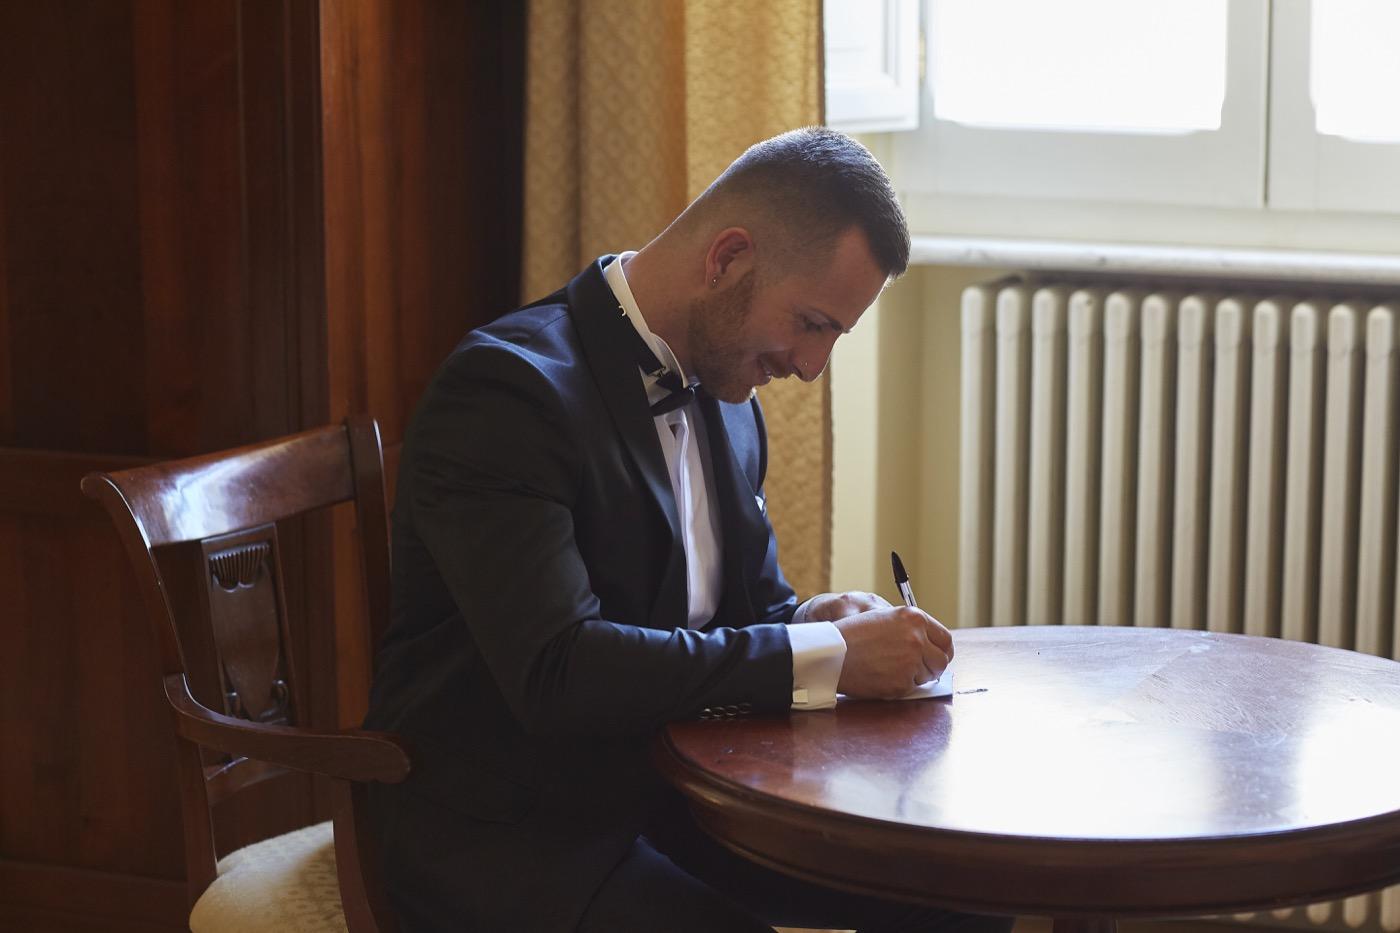 Claudio-Coppola-wedding-photographer-la-scuderia-eventi-preparativi-la-rosetta-perugia-13